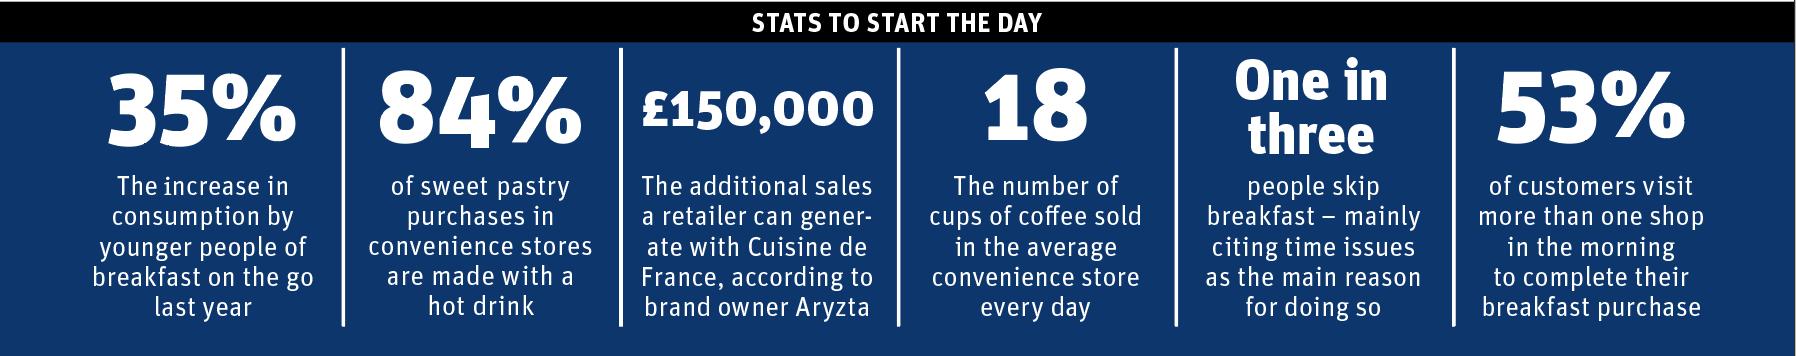 Breakfast stats.png